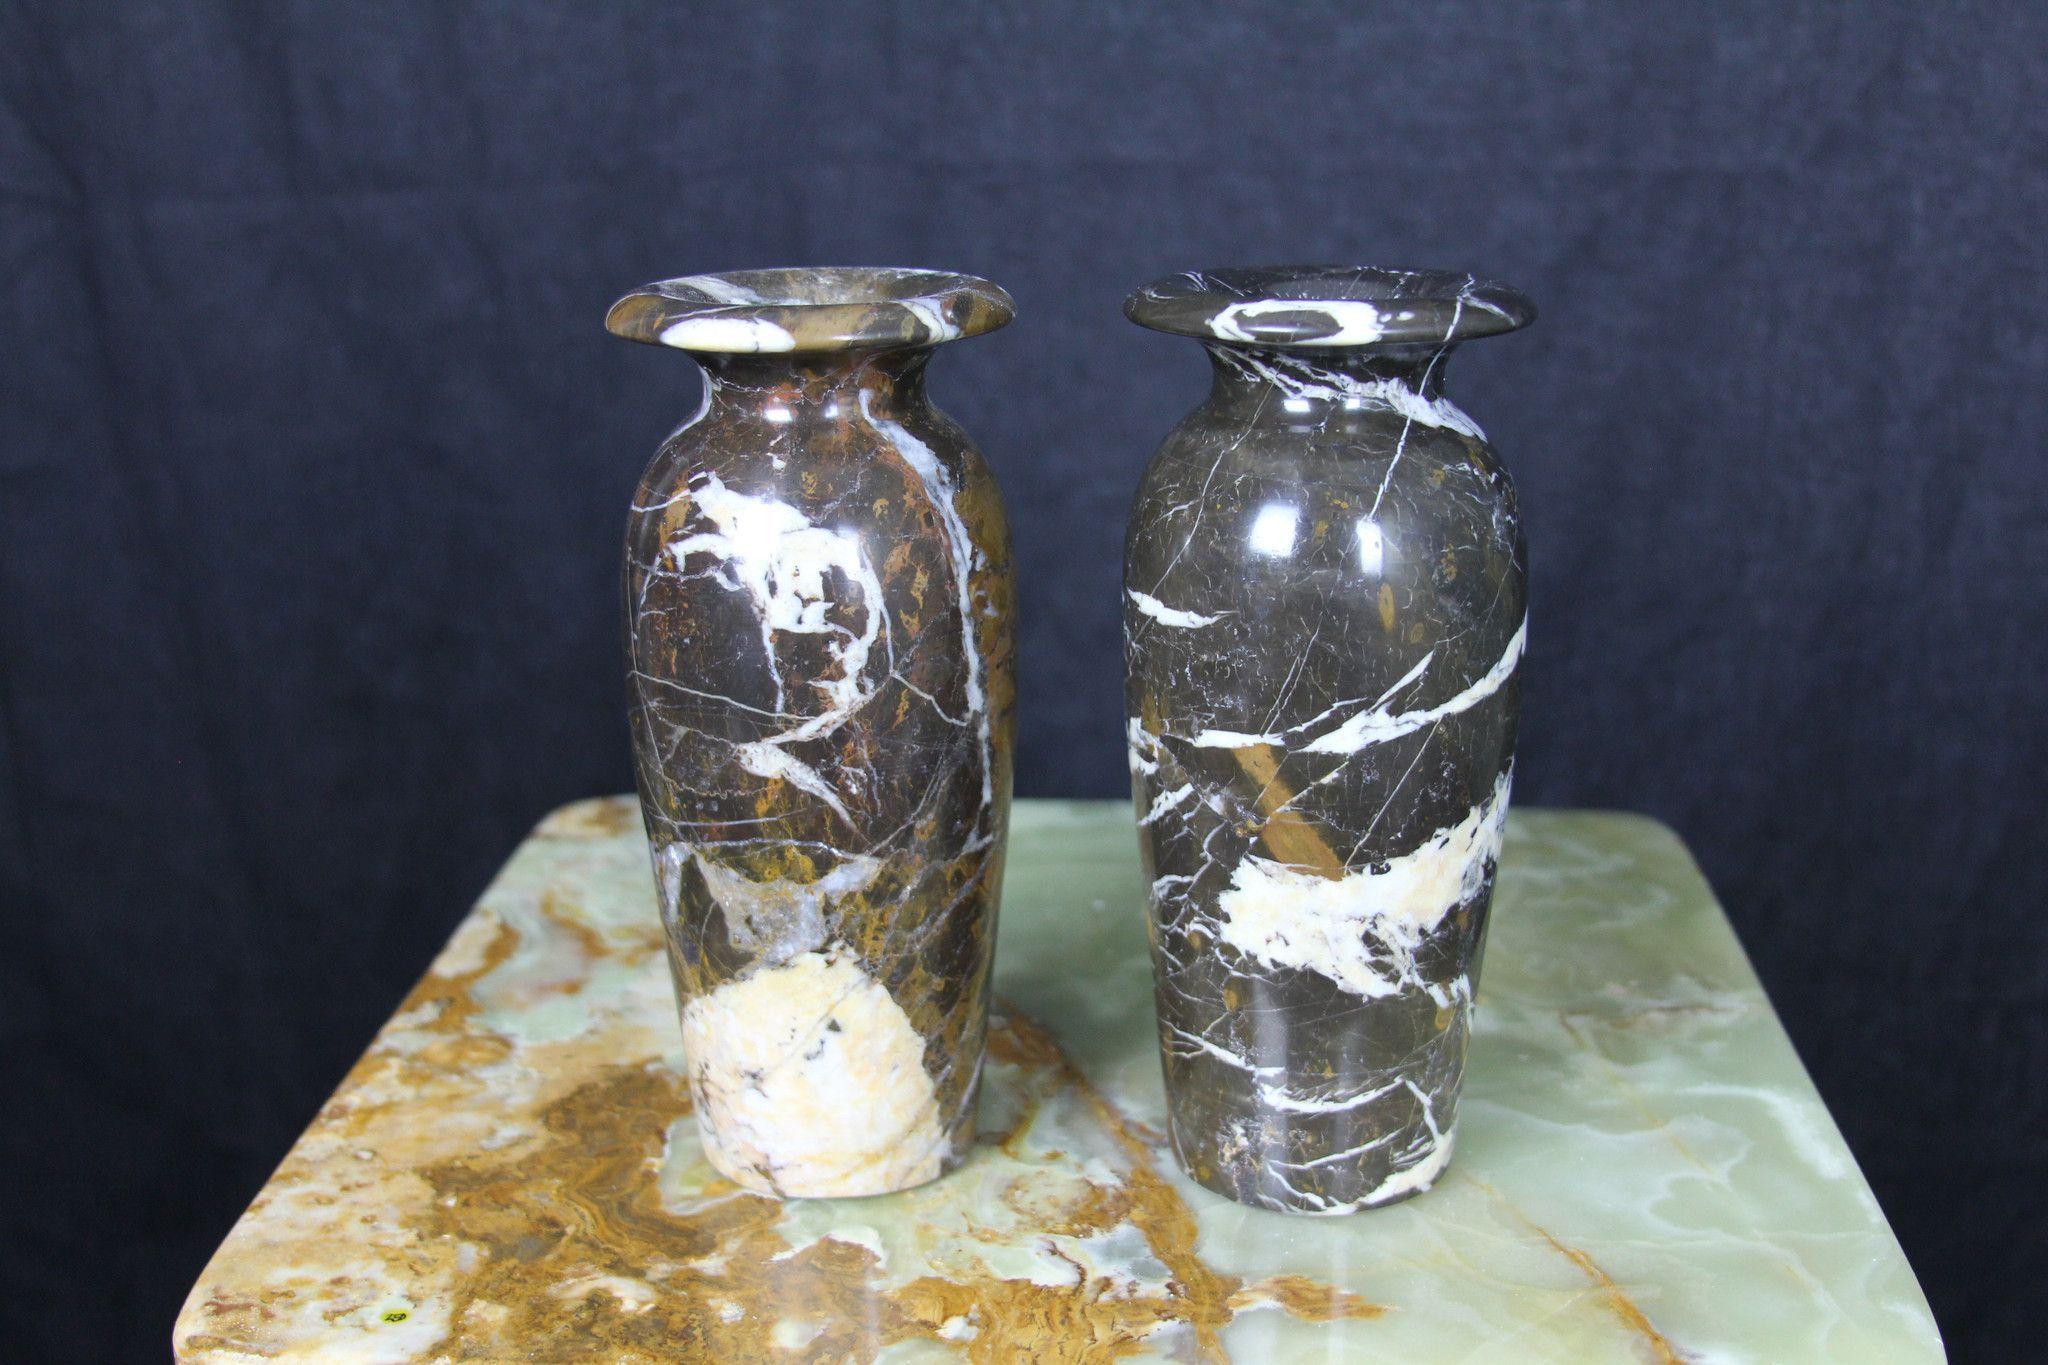 Gold Black White Zebra Vase Onyx Marble #7110 | Products | Pinterest ...